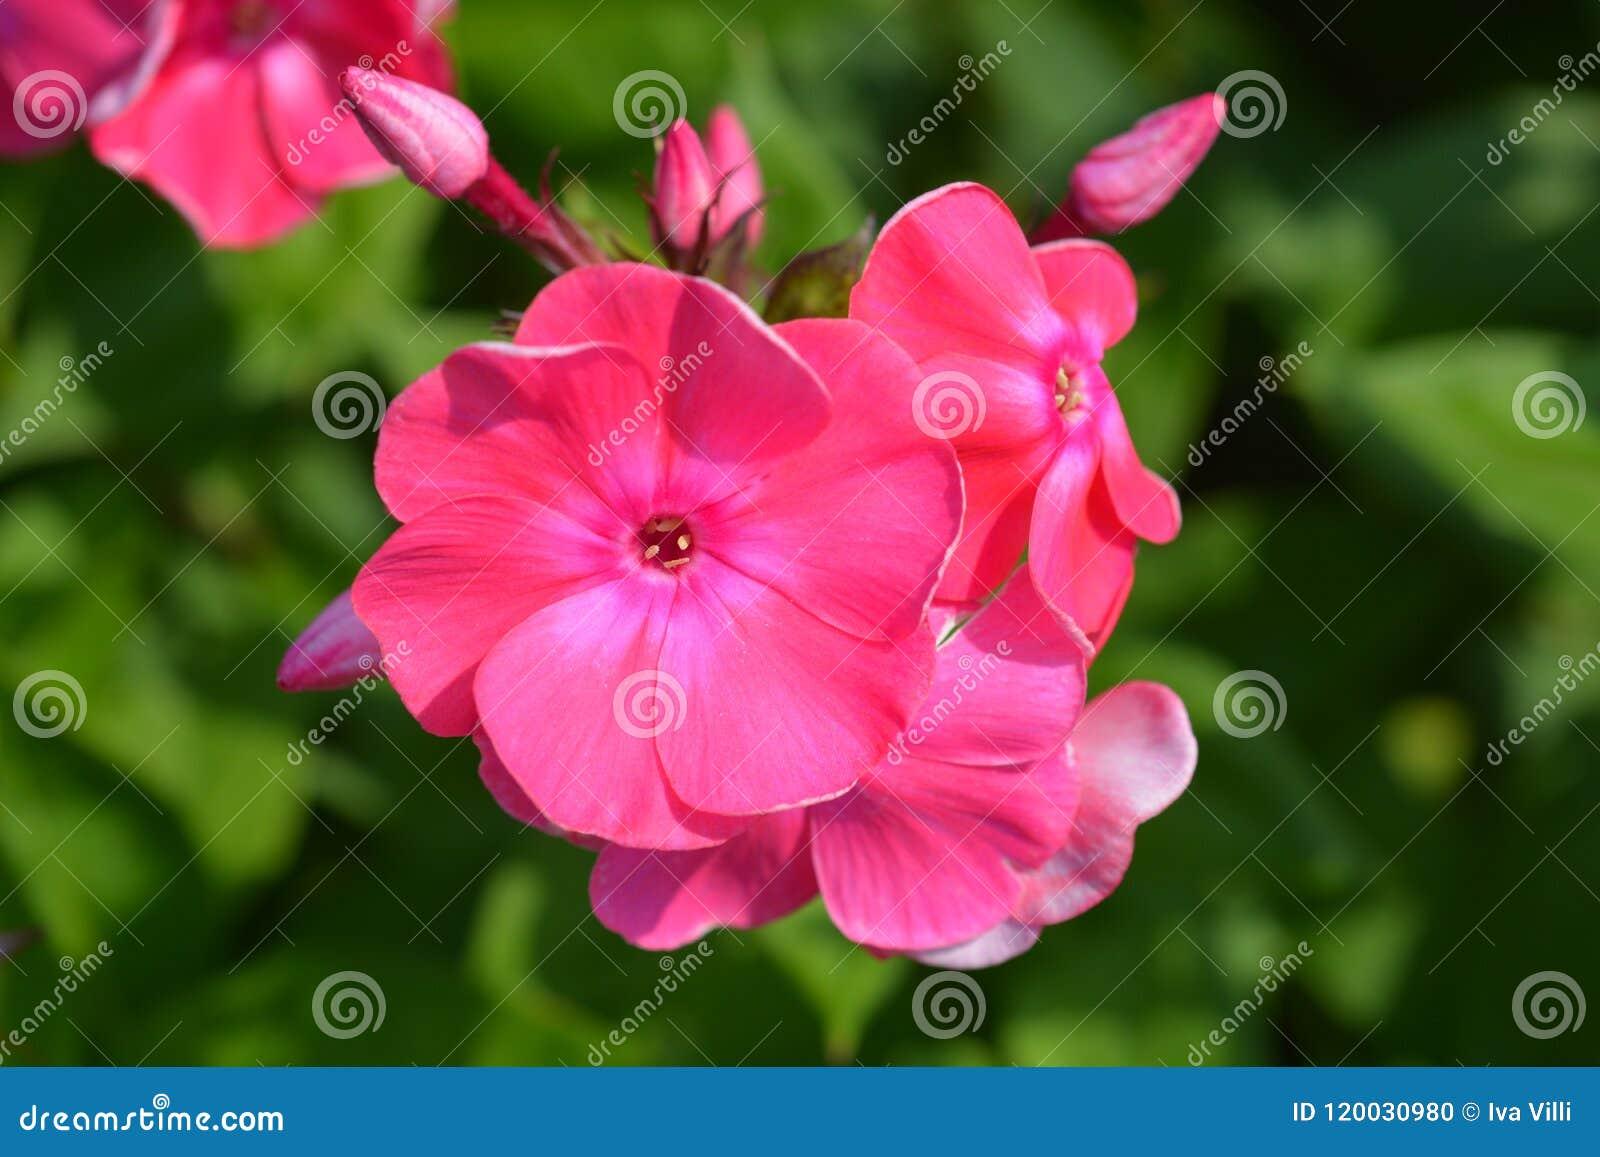 Garden Phlox Stock Photo Image Of Flower Name Pink 120030980